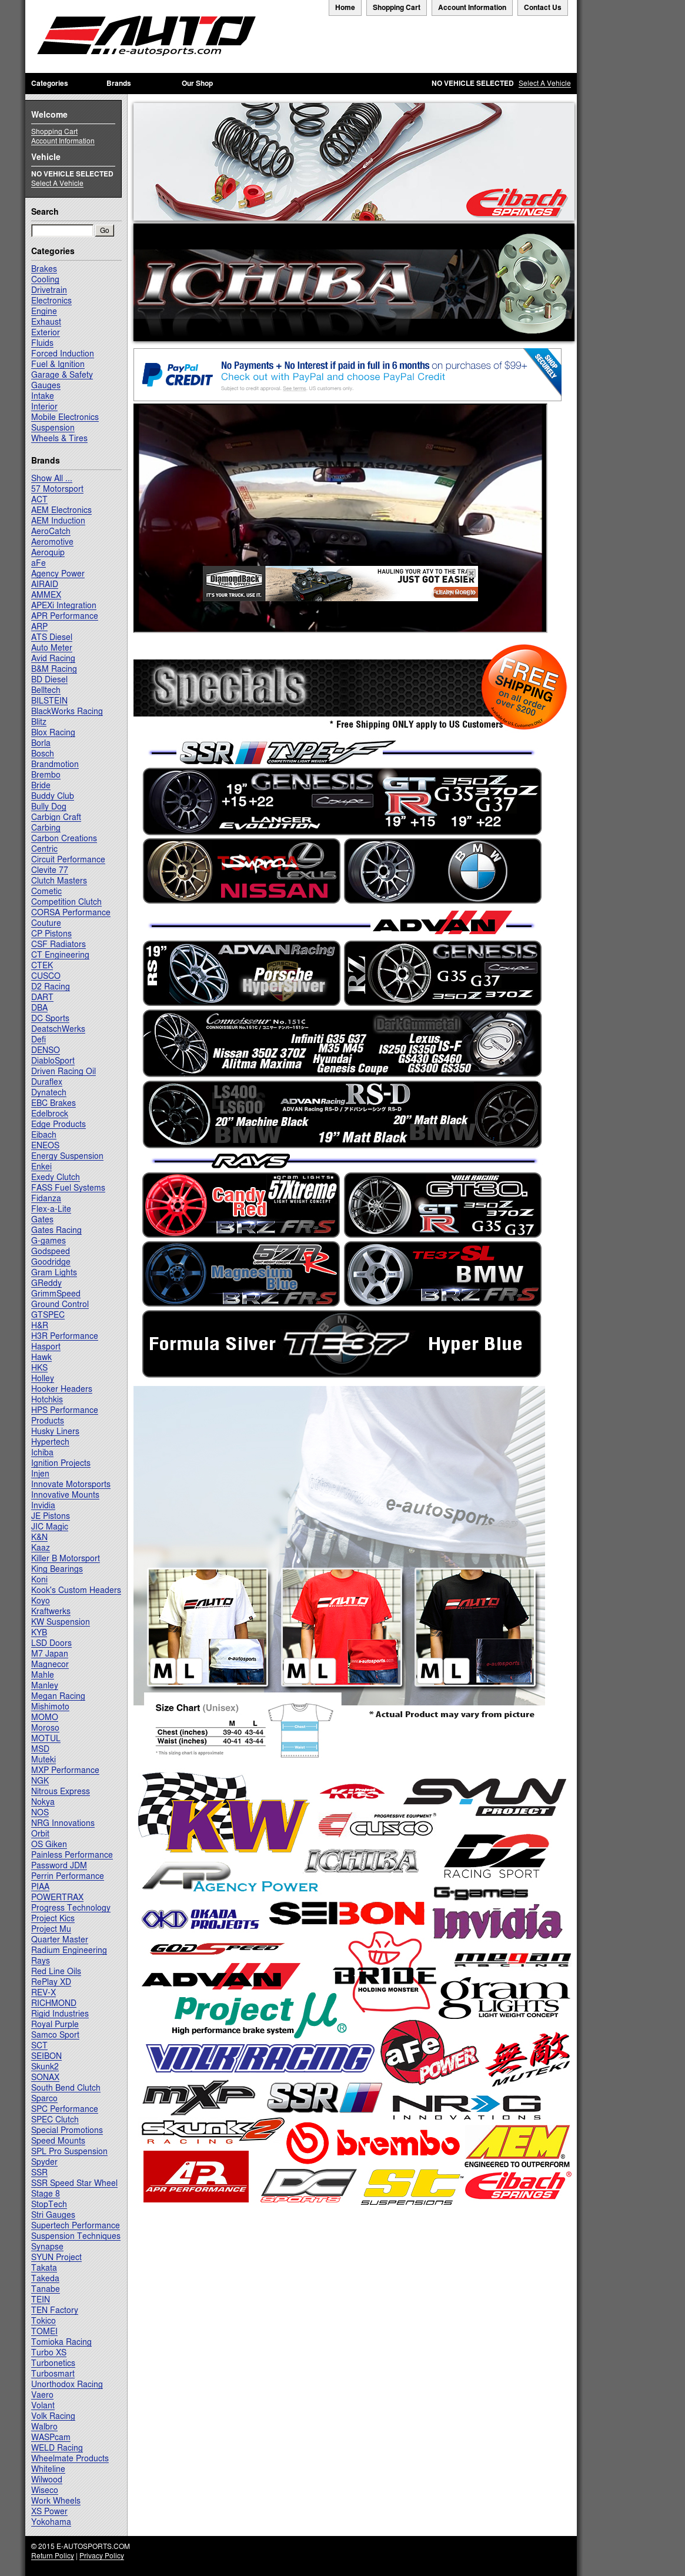 E Auto Competitors, Revenue and Employees - Owler Company Profile